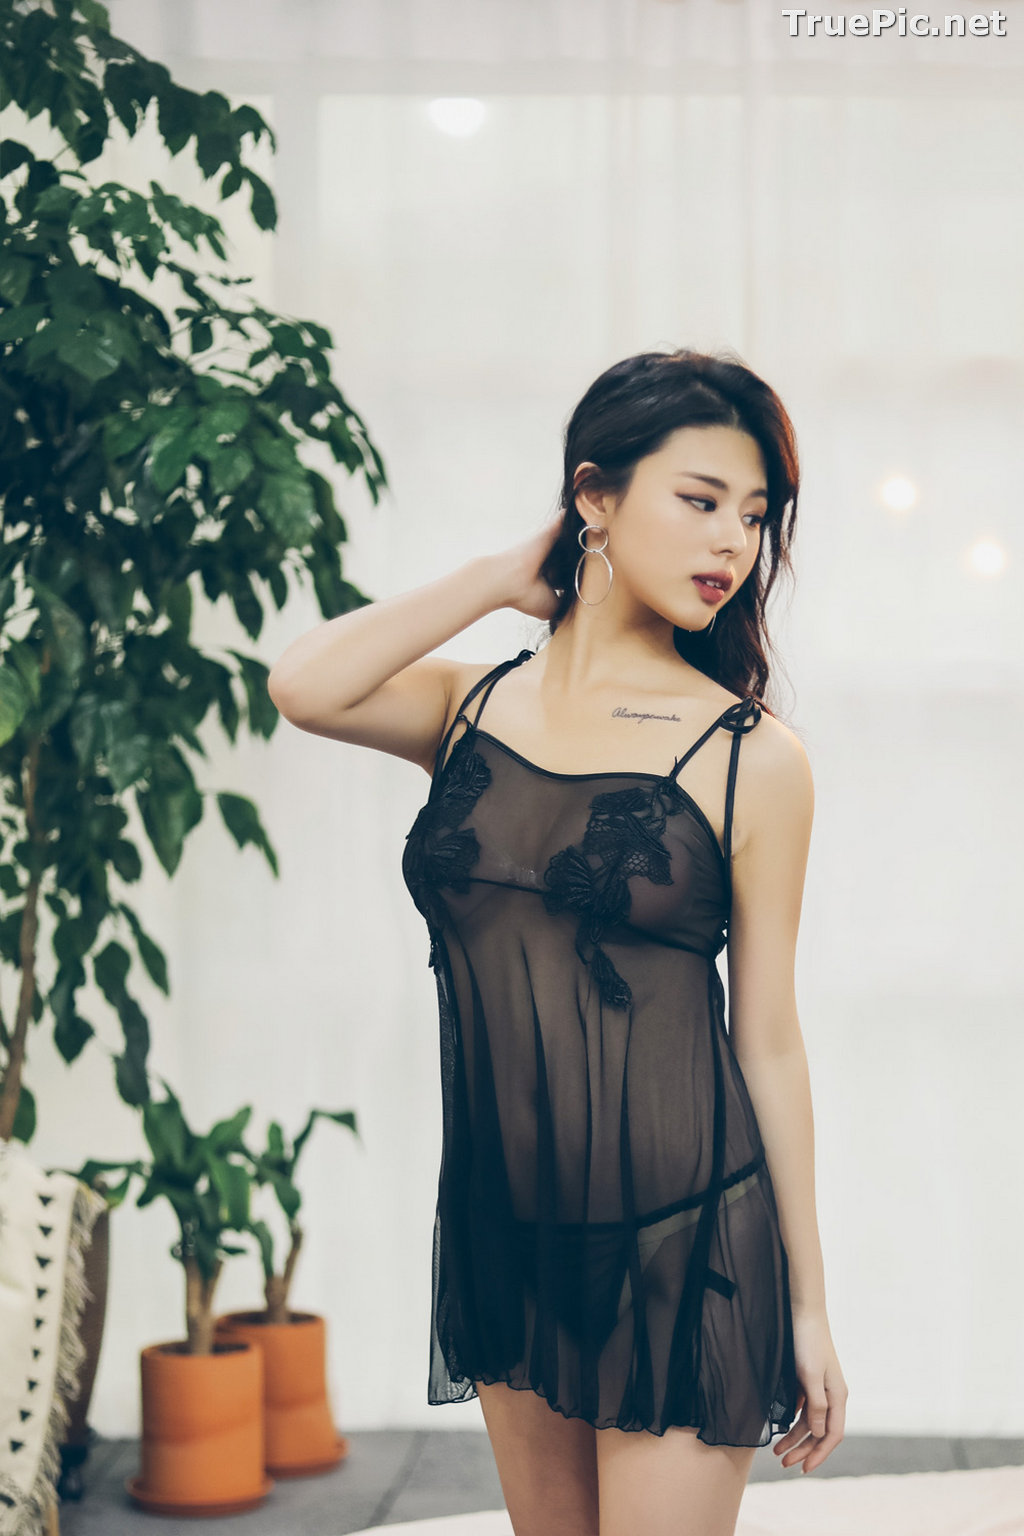 Image Jung Yuna - Korean Fashion Model - Black Transparent Lingerie Set - TruePic.net - Picture-8